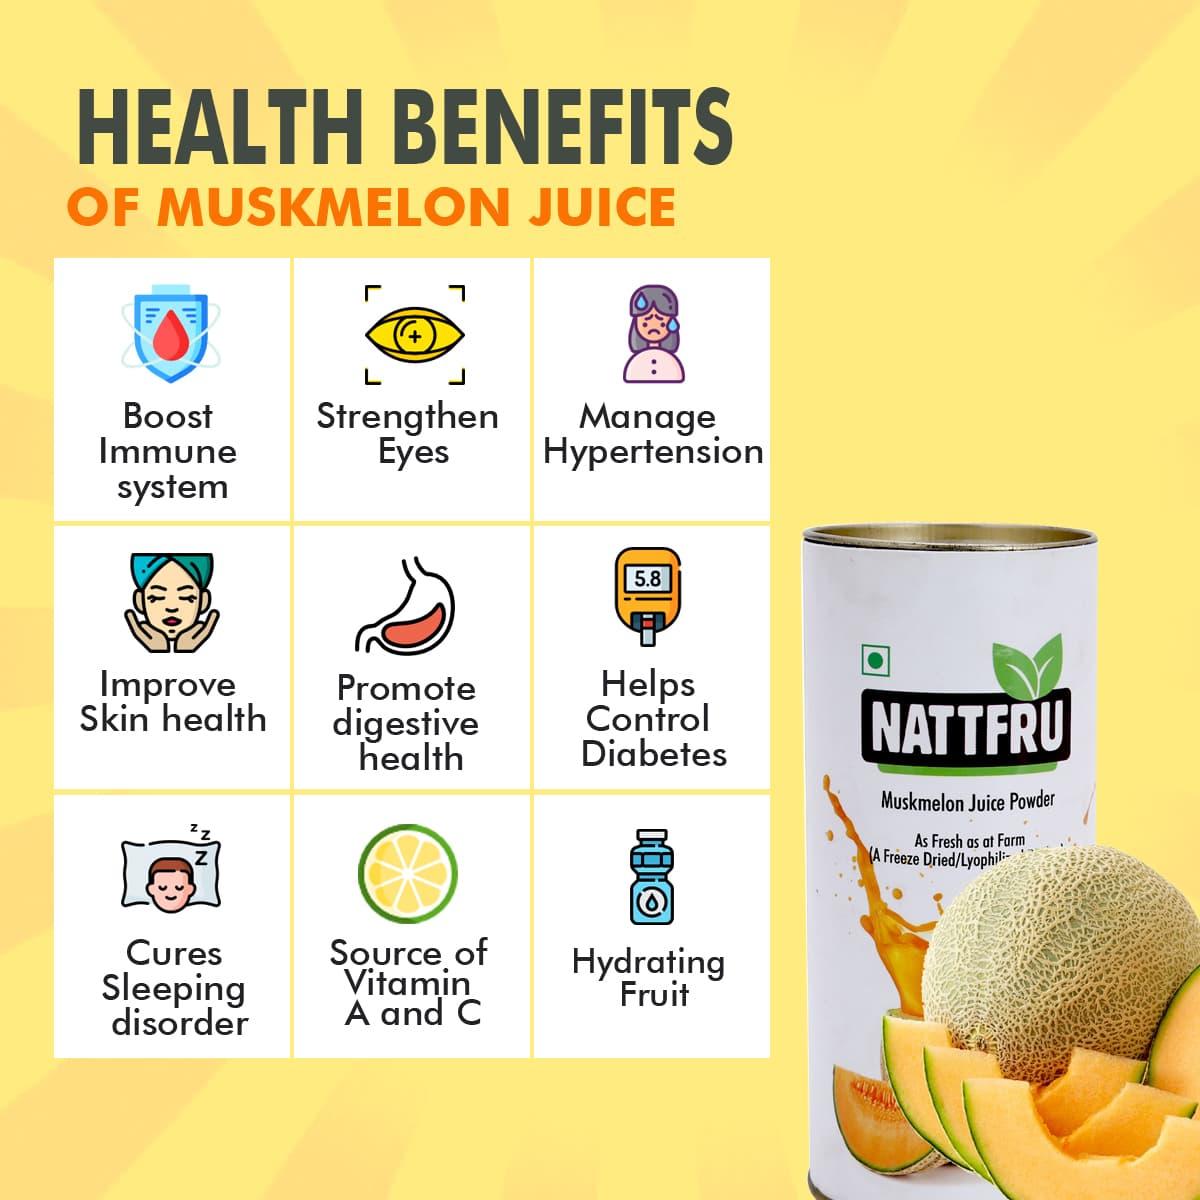 muskmelon juice powder